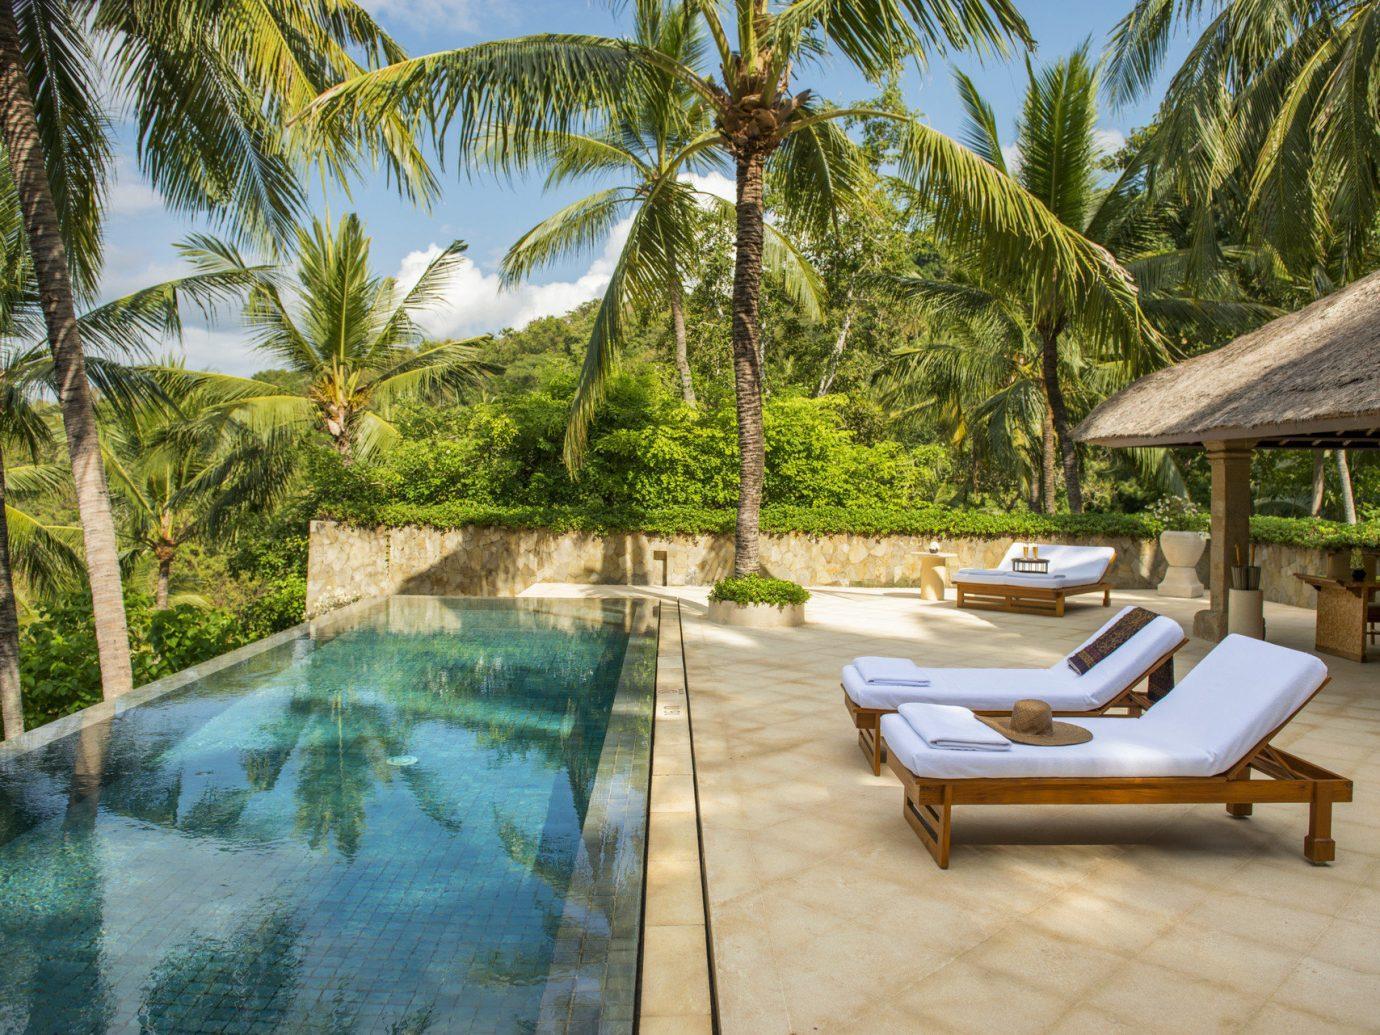 Health + Wellness Hotels tree outdoor swimming pool leisure property Resort estate vacation palm Villa backyard caribbean area plant